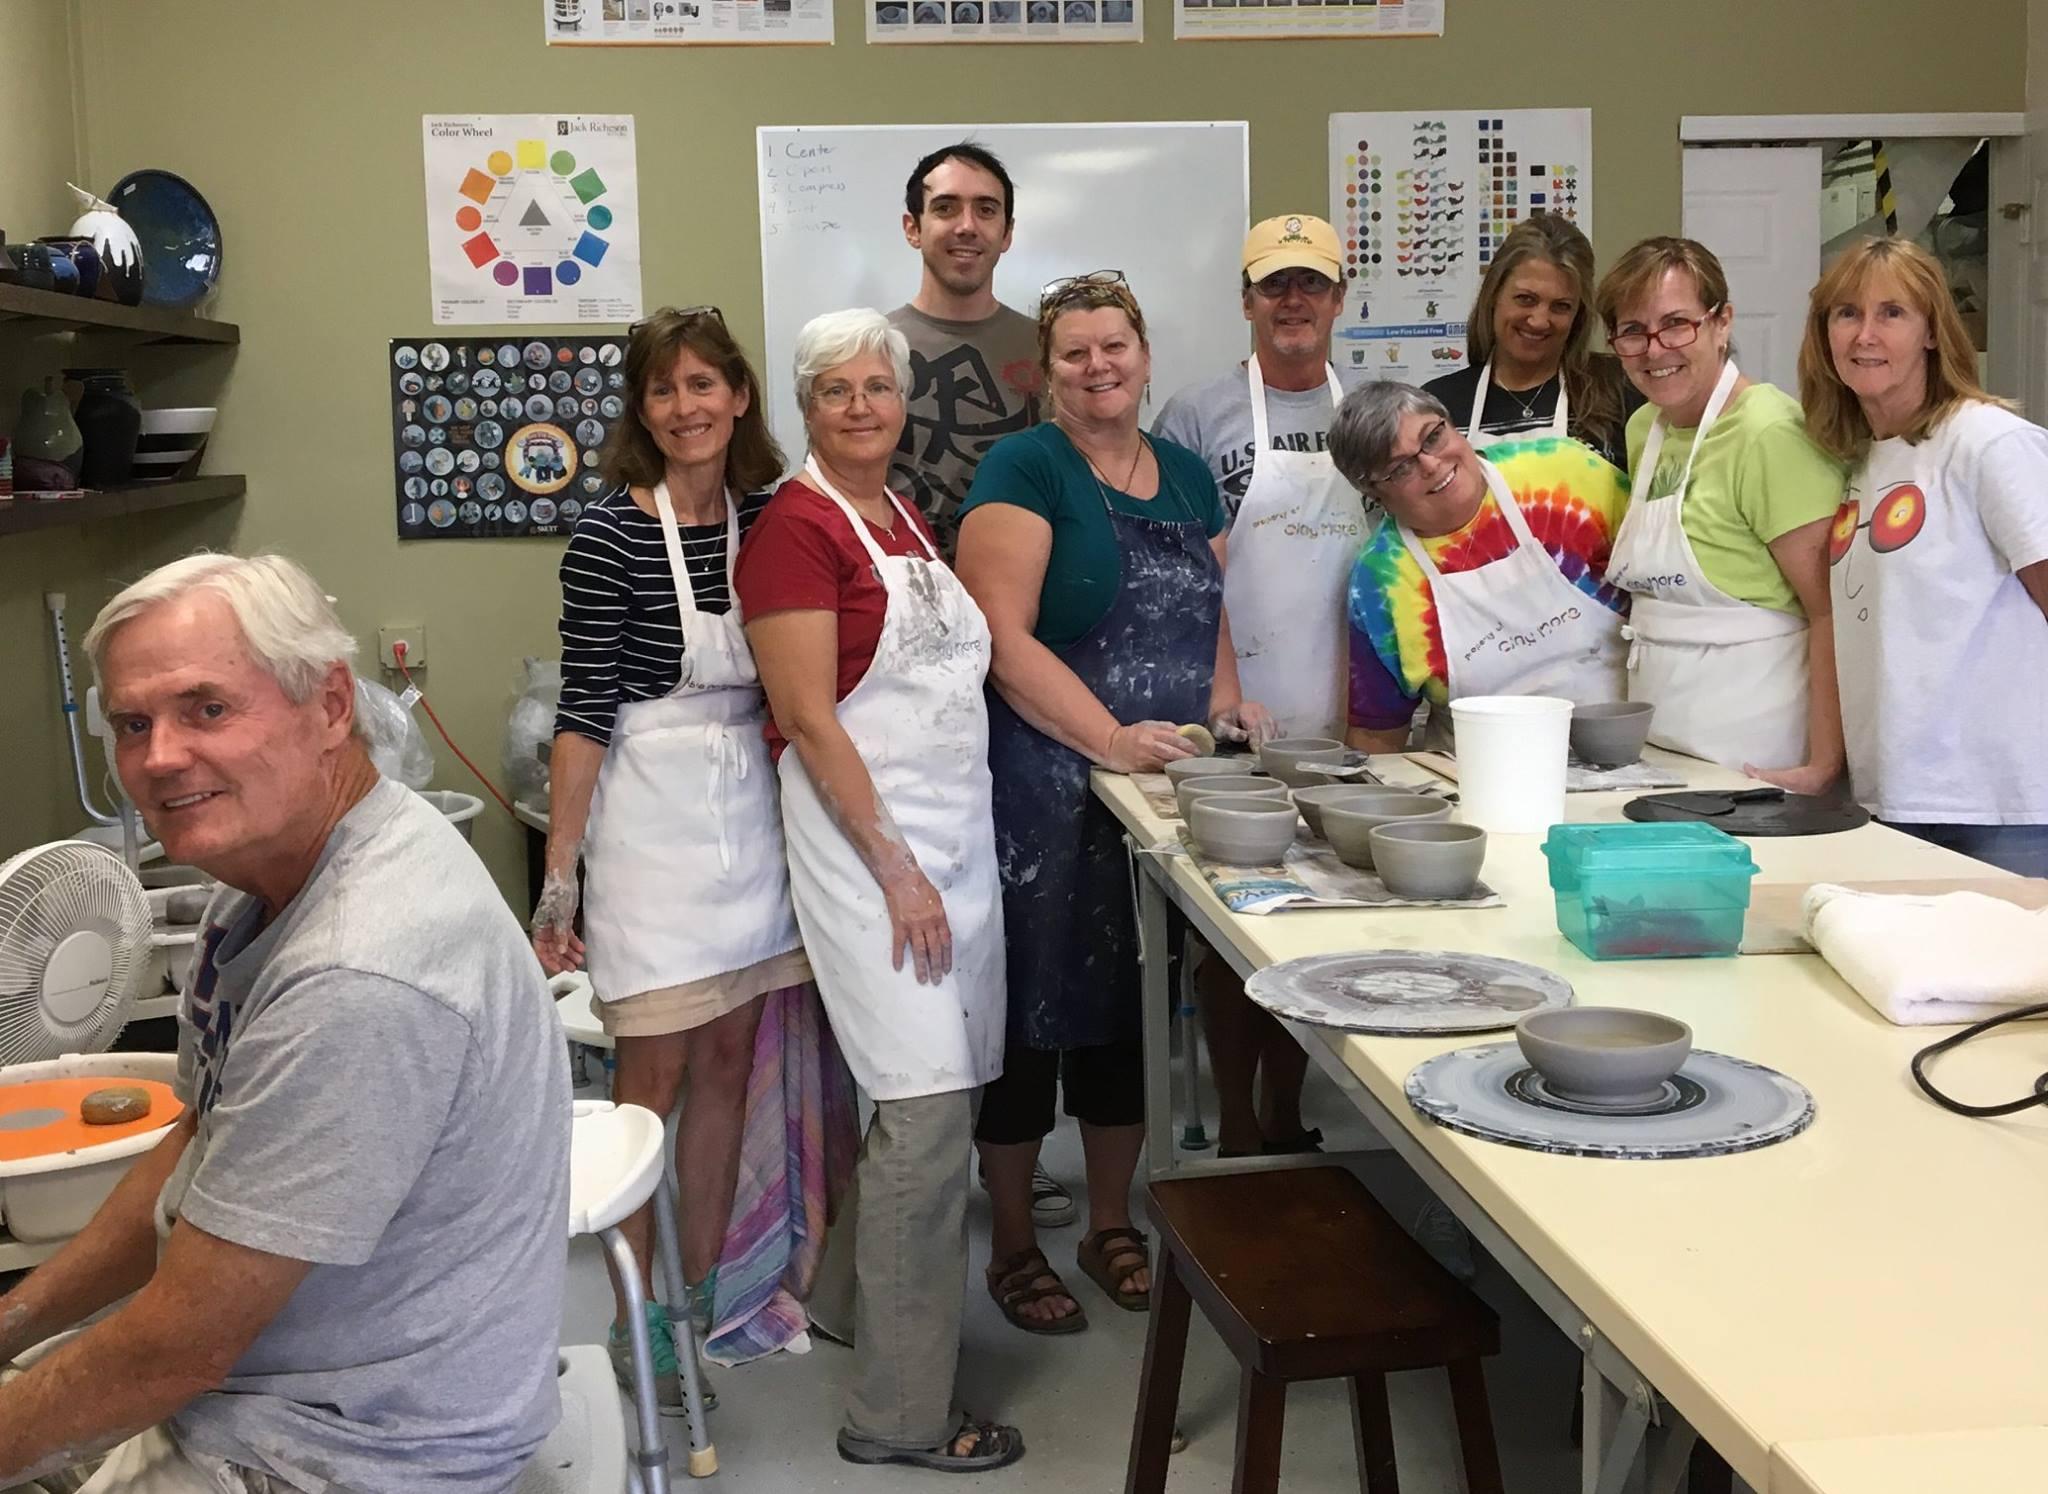 Clay More Ceramics hosts a clay creation event